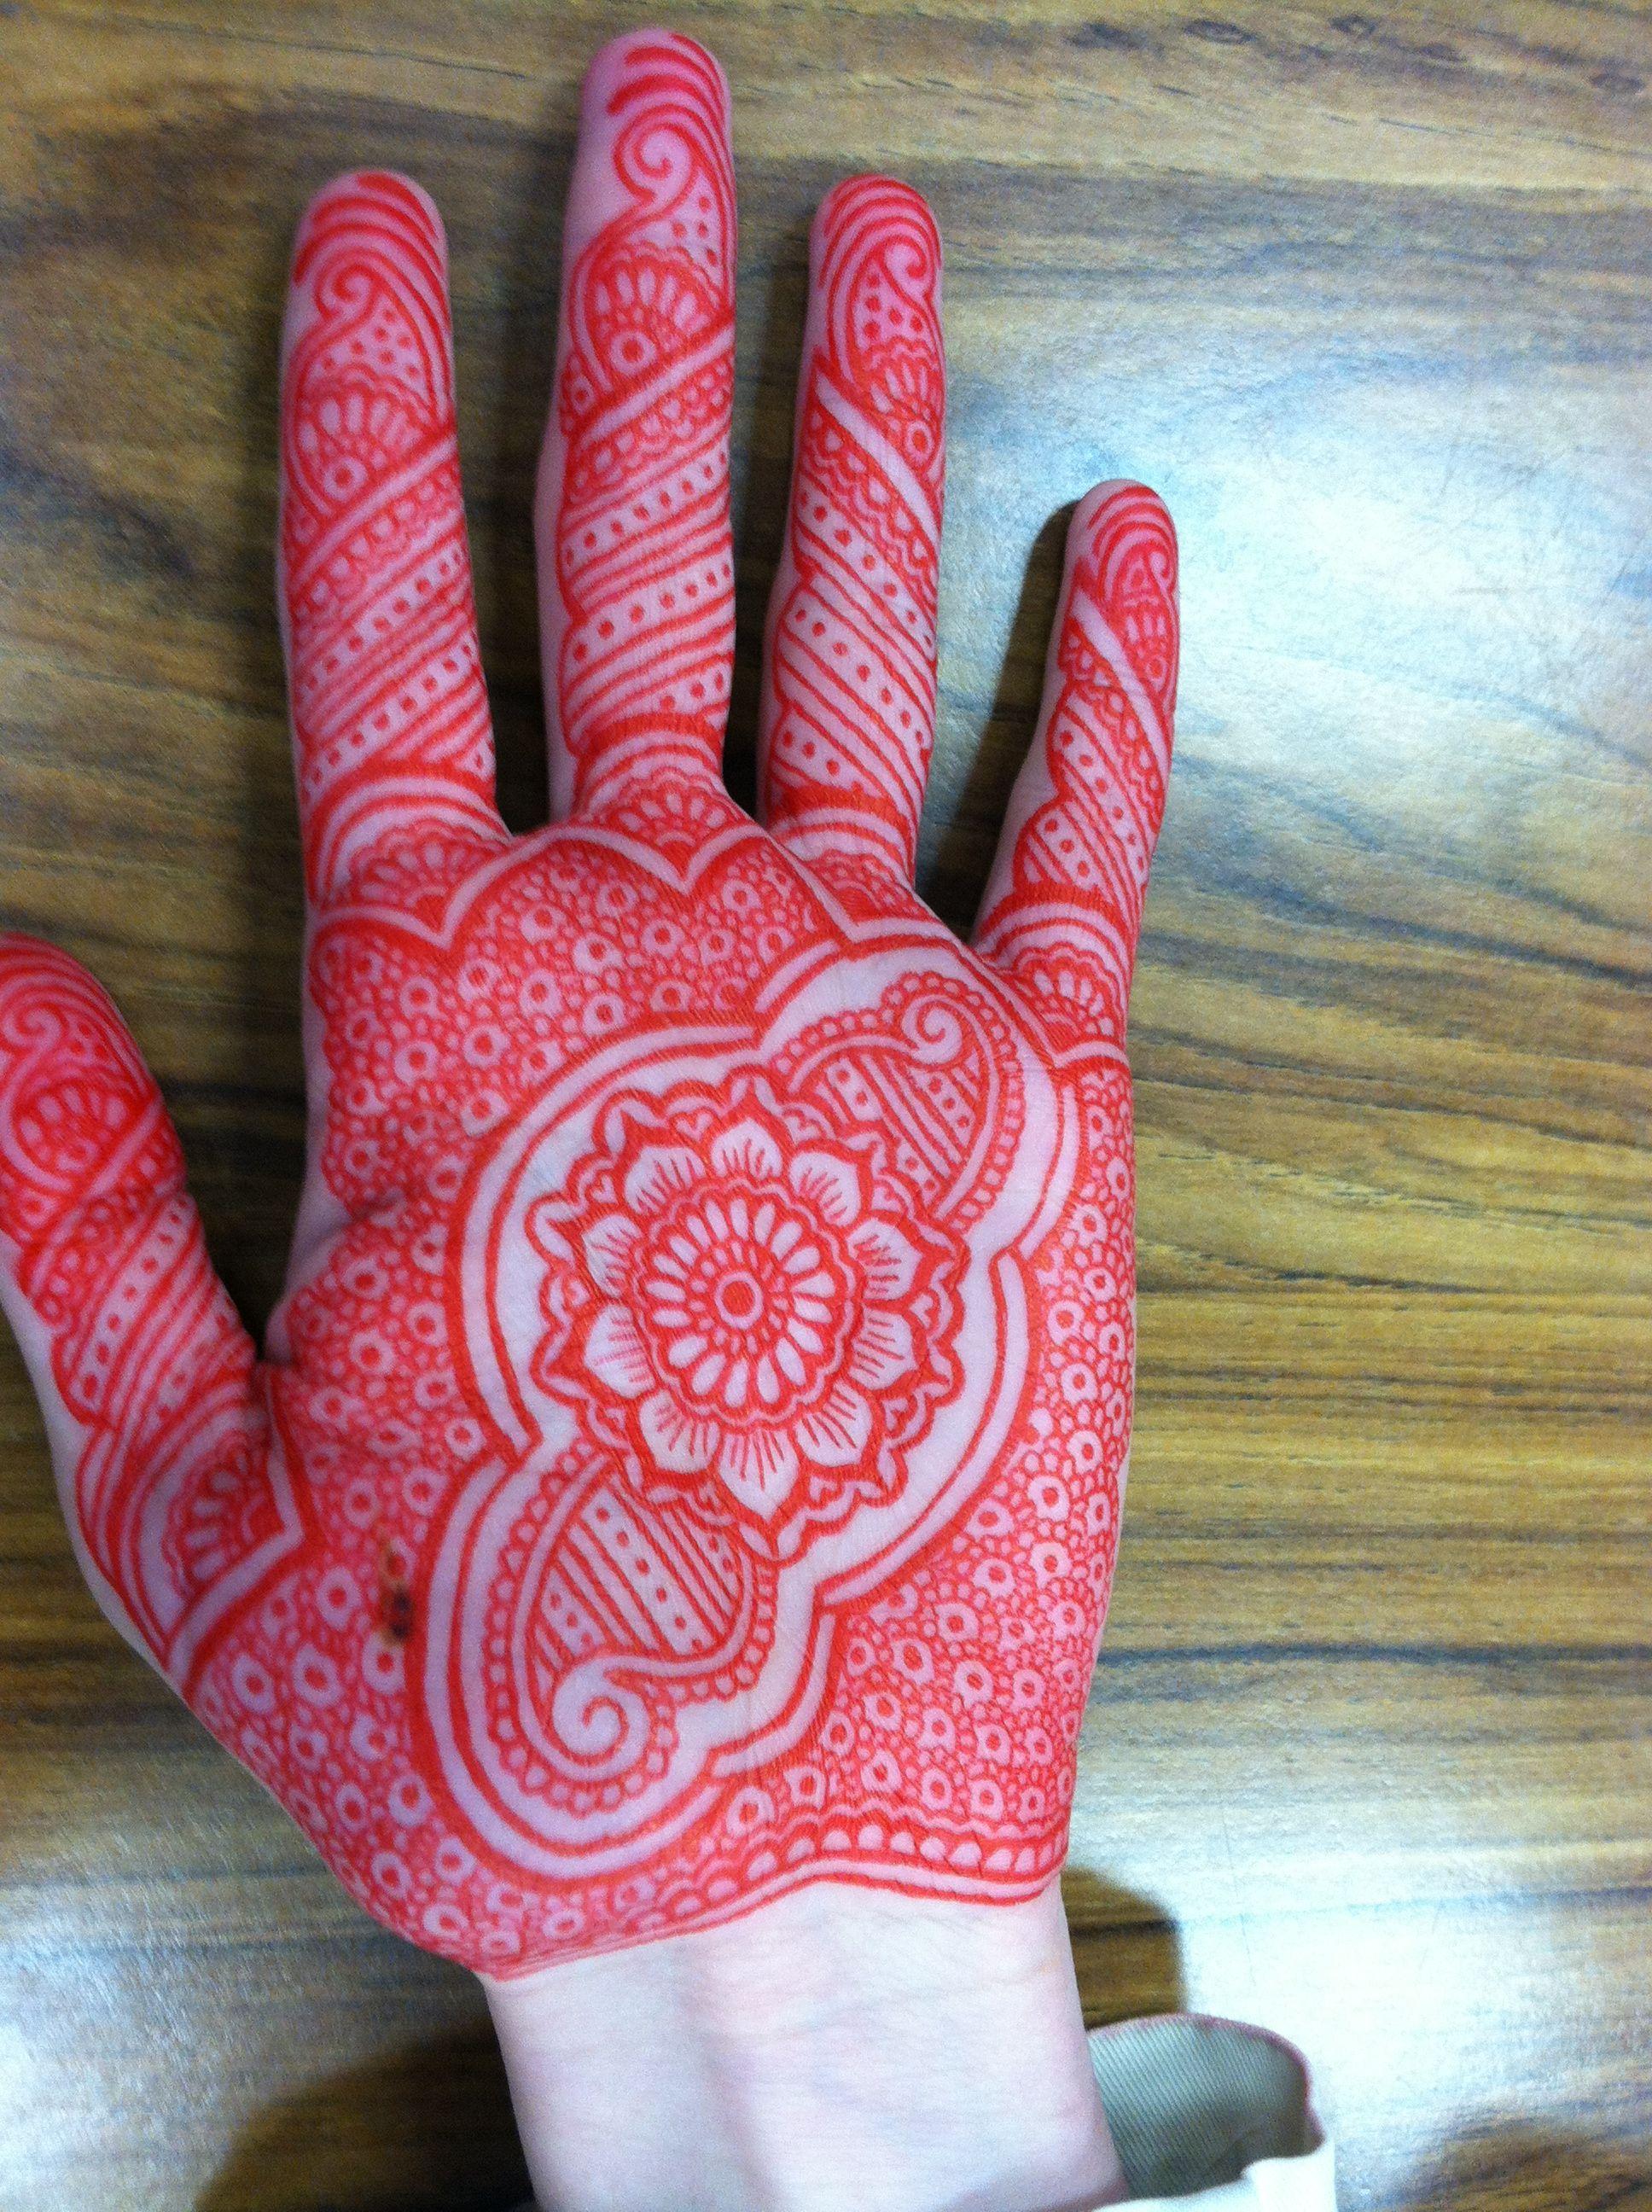 Mehndi Henna Pen : Henna designs with a red gel pen pinterest